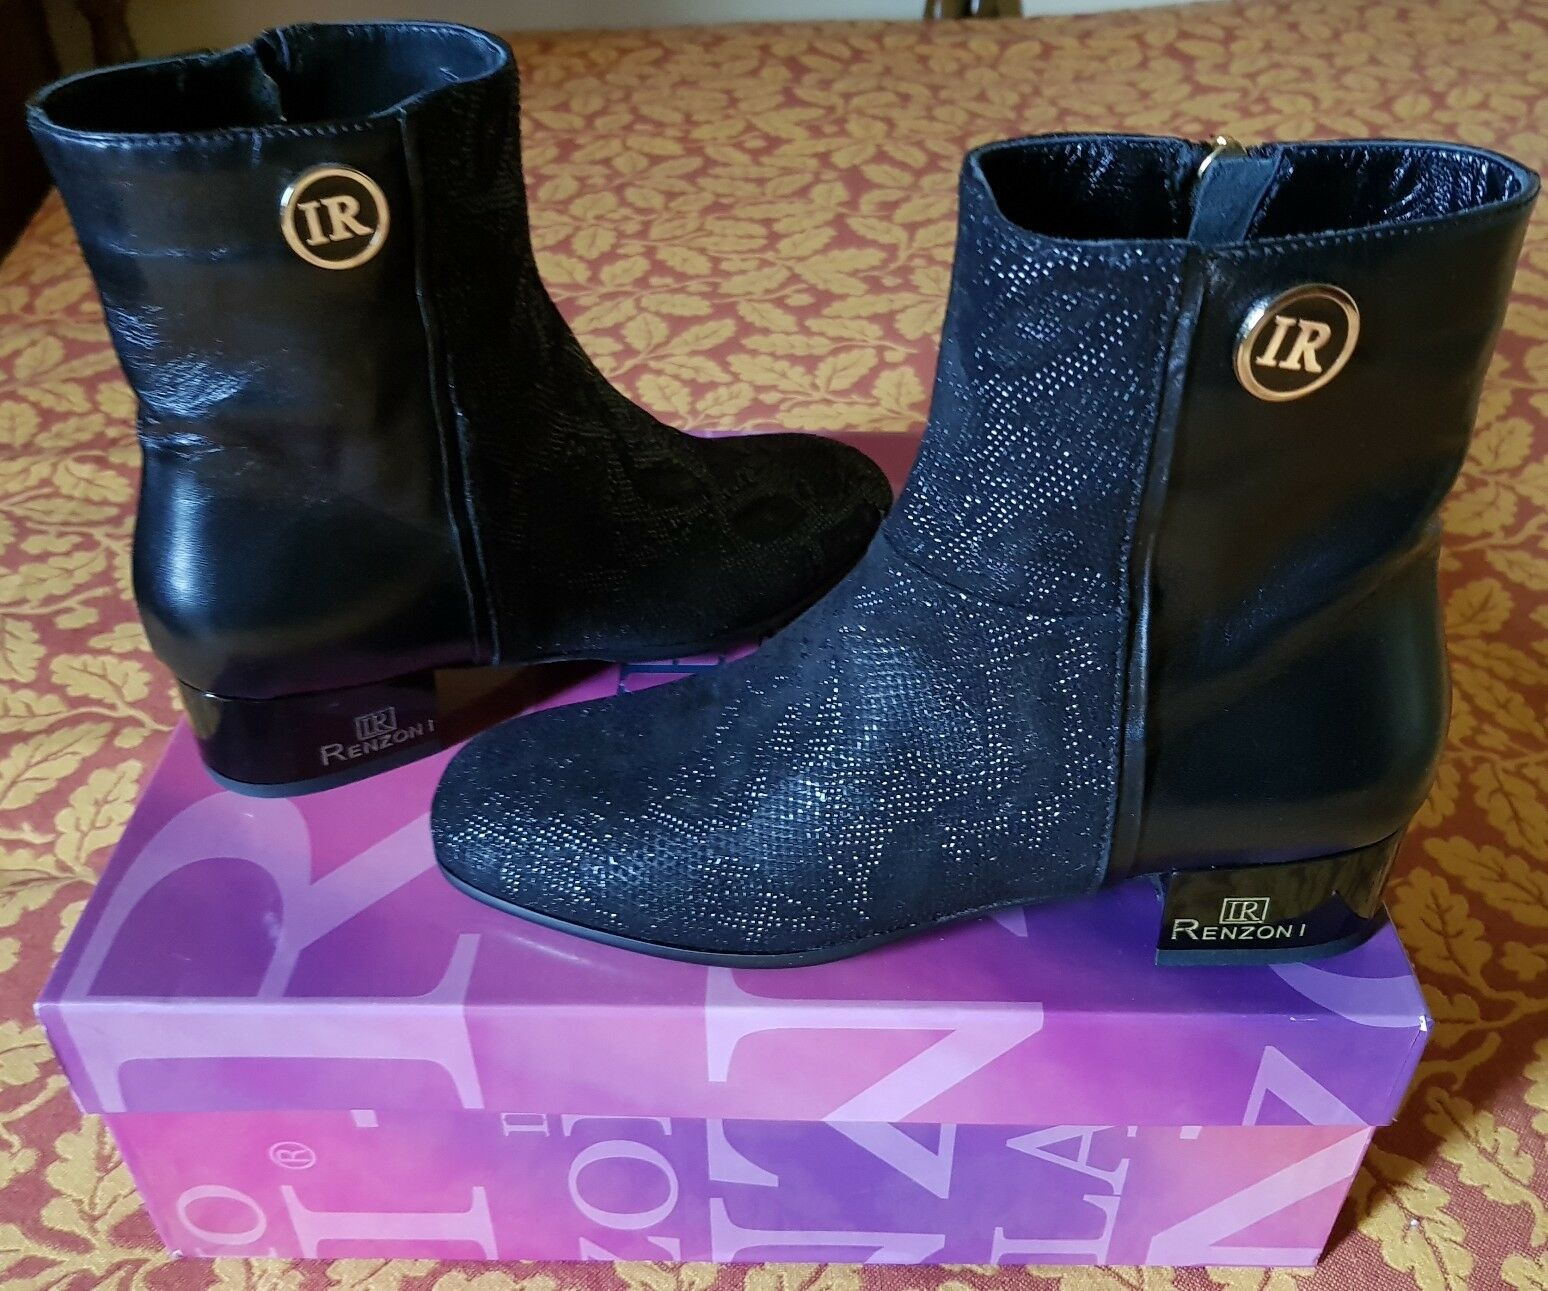 RENZONI Stivaletti leather neri pelle comodi eleganti leather Stivaletti boots Nuovi c5bd81